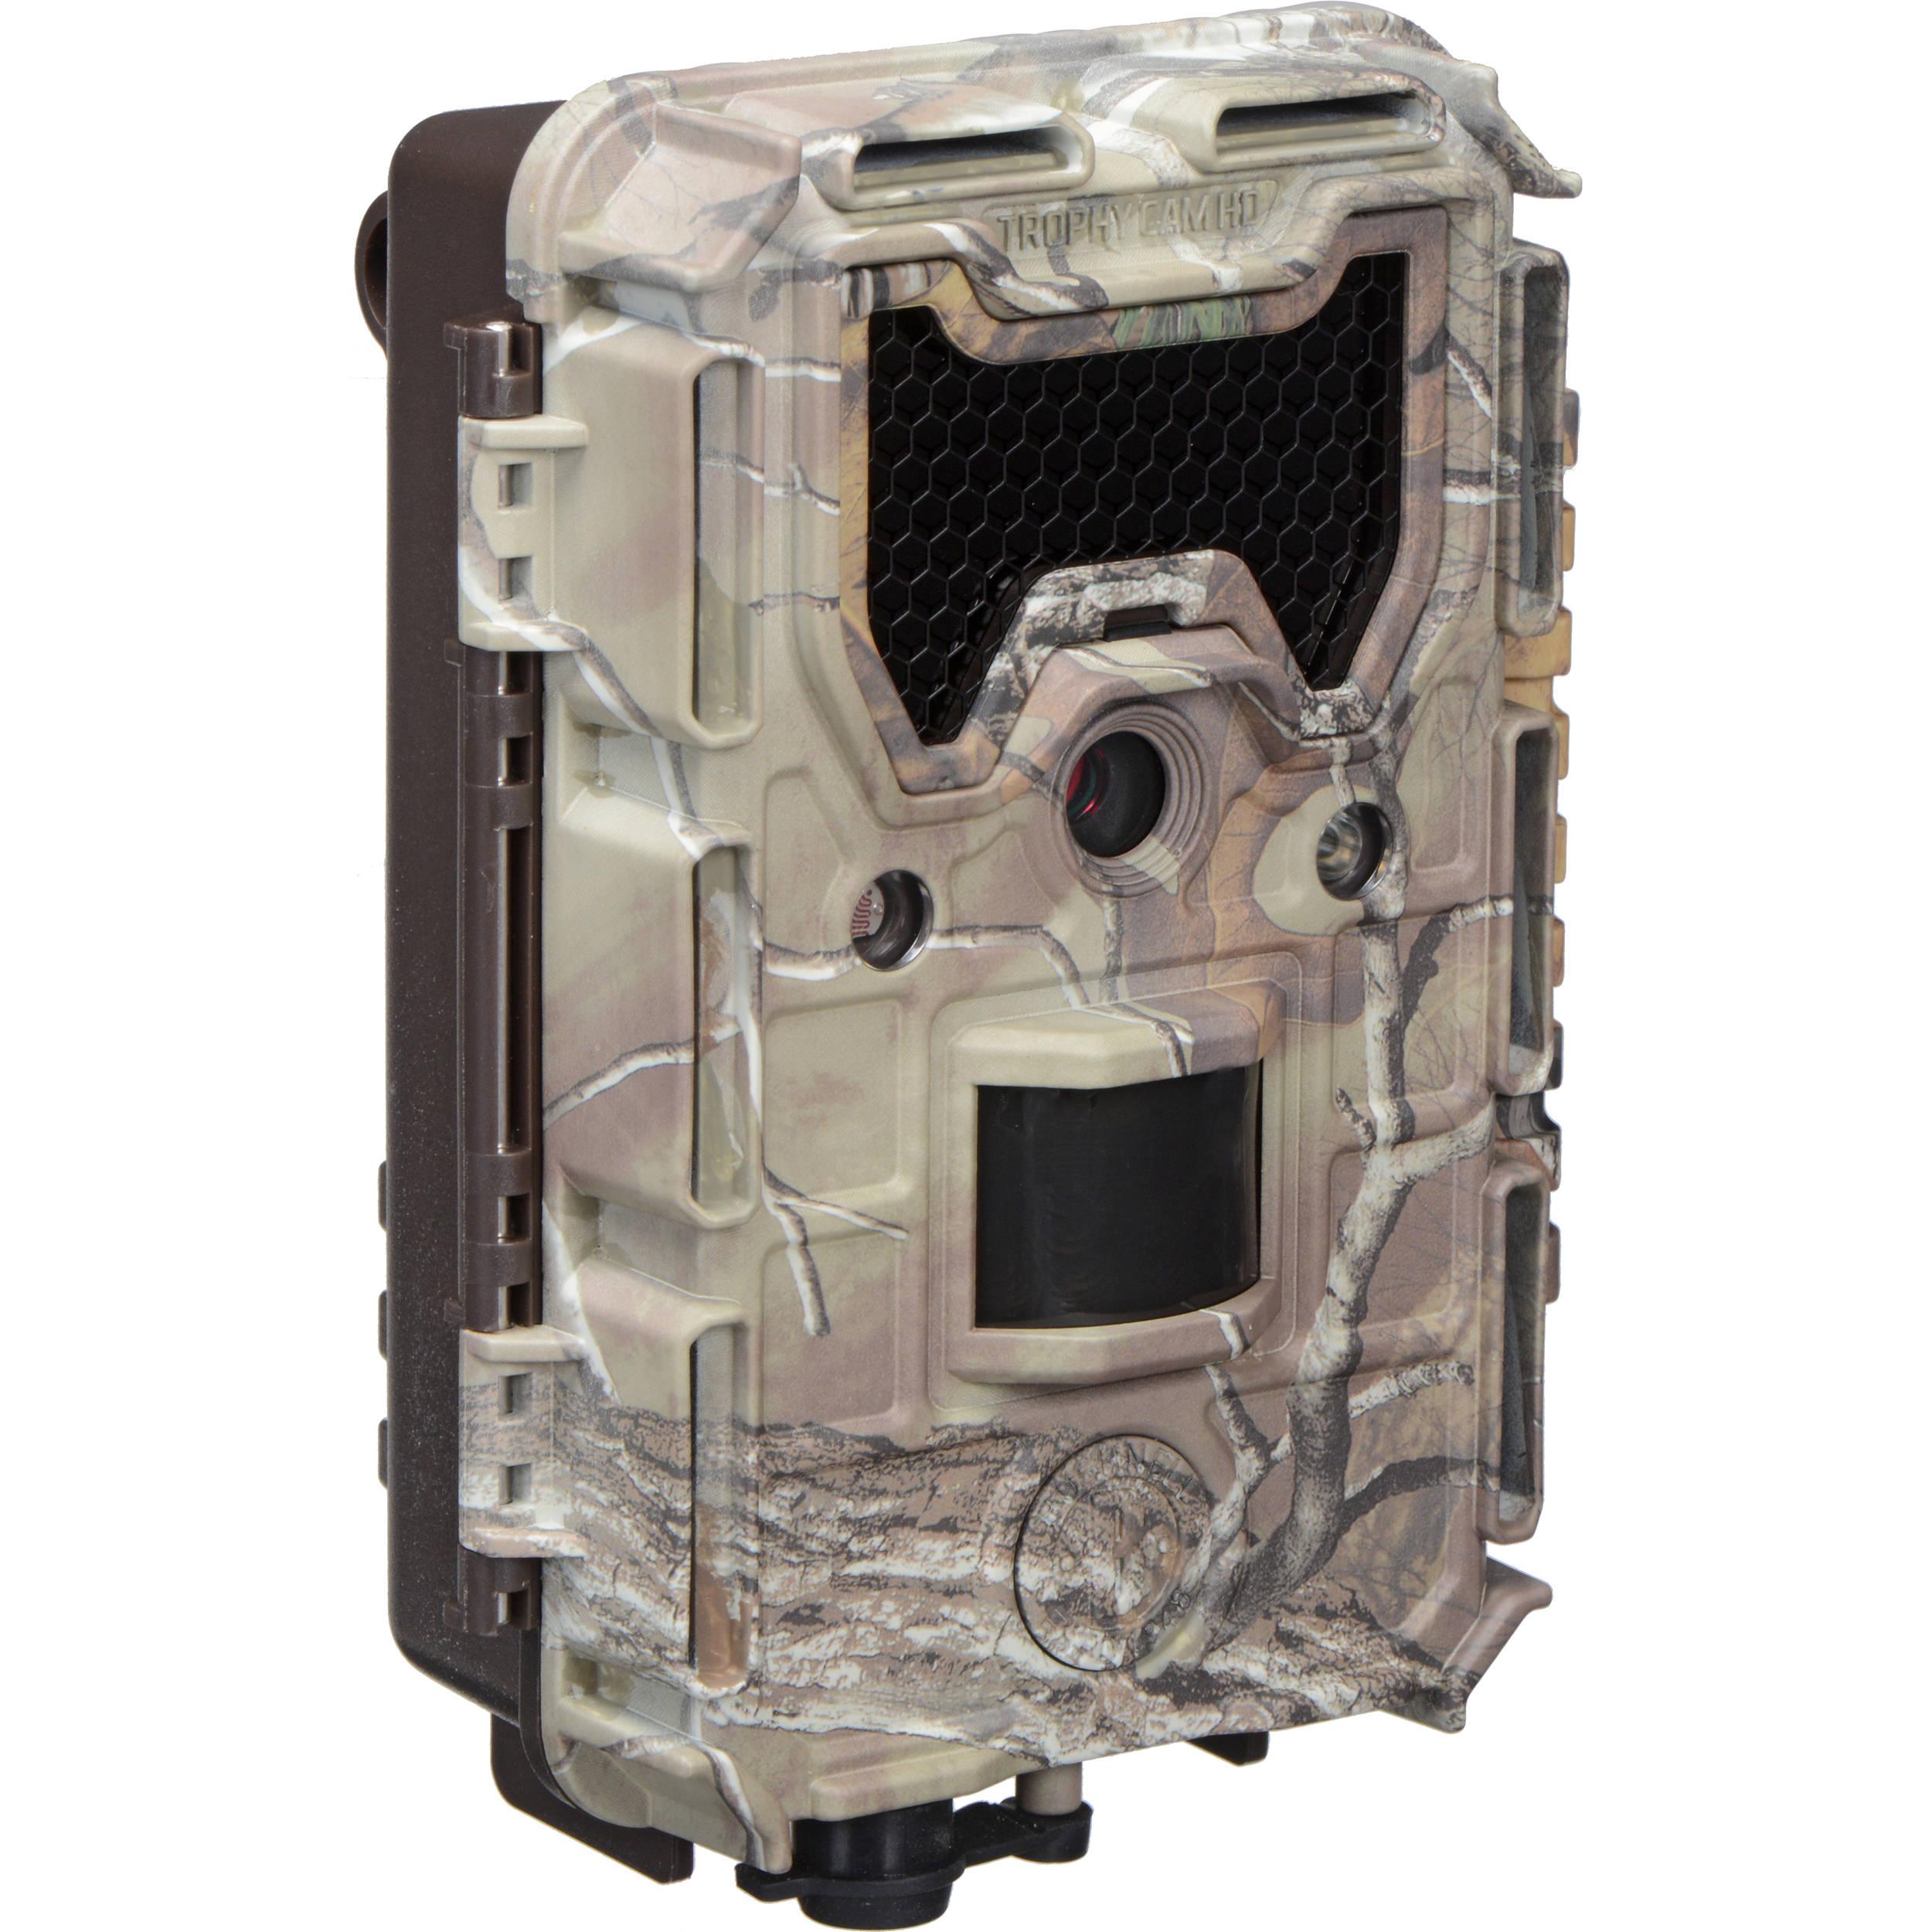 c product  REG bushnell mp trophy camera hd